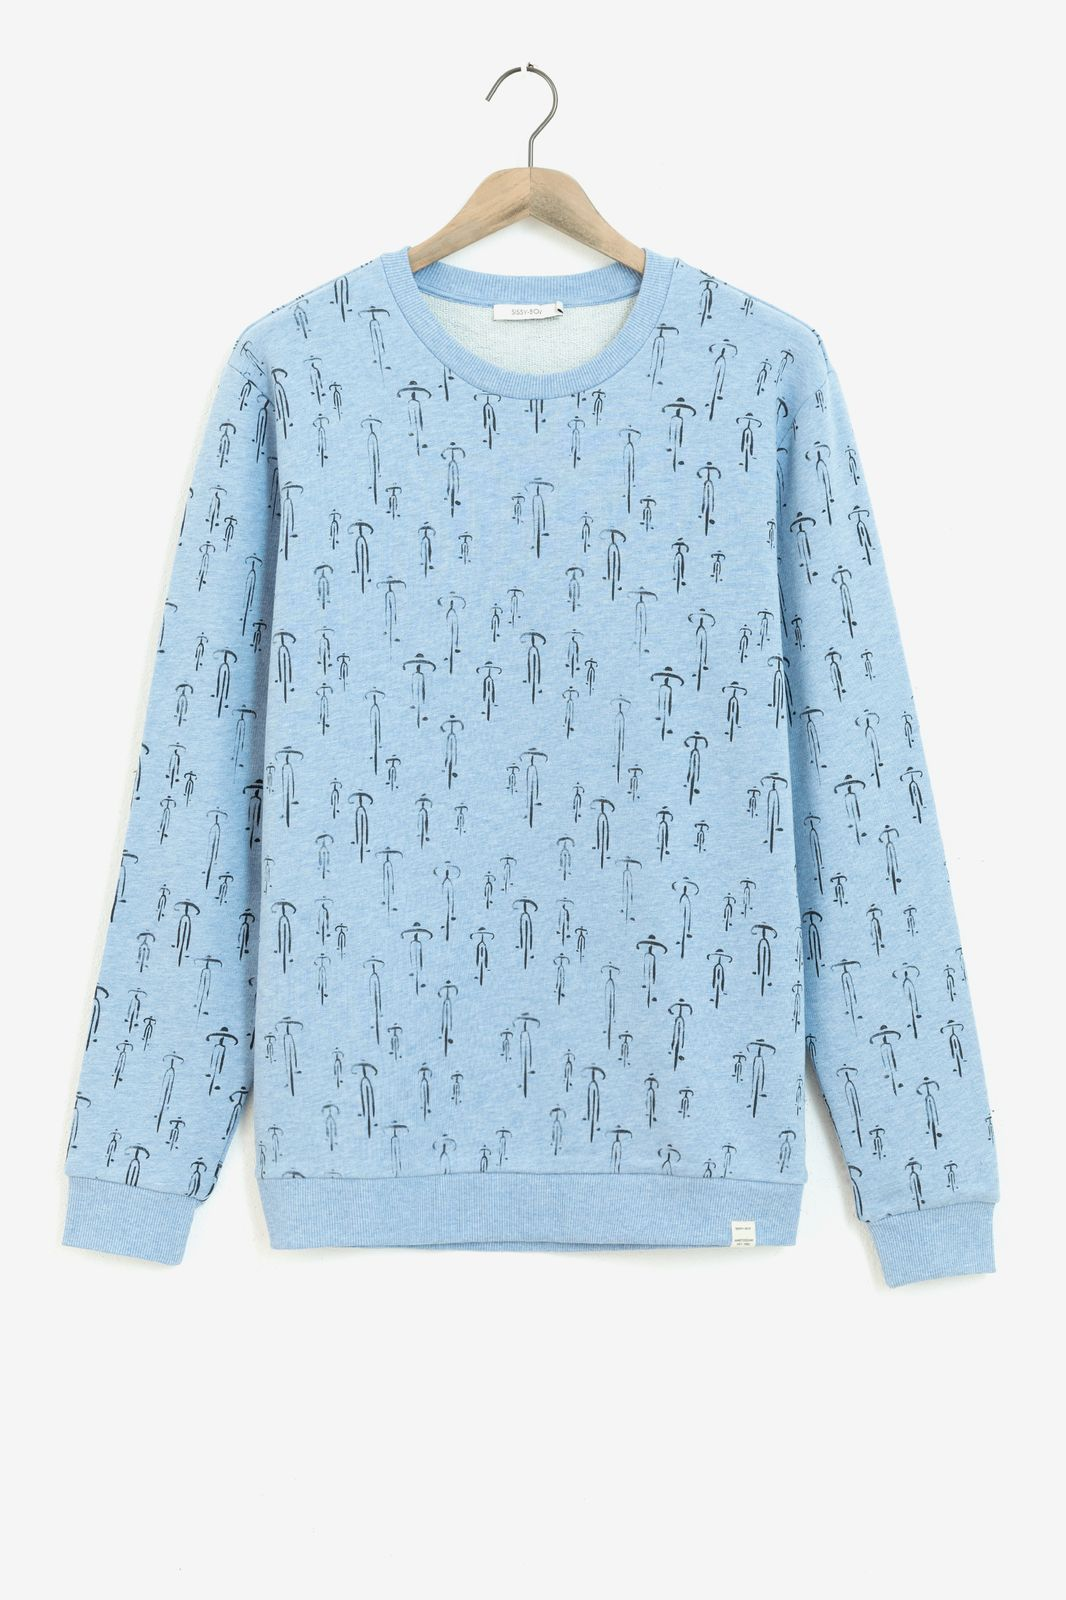 Lichtblauwe sweater met all over print - Heren | Sissy-Boy